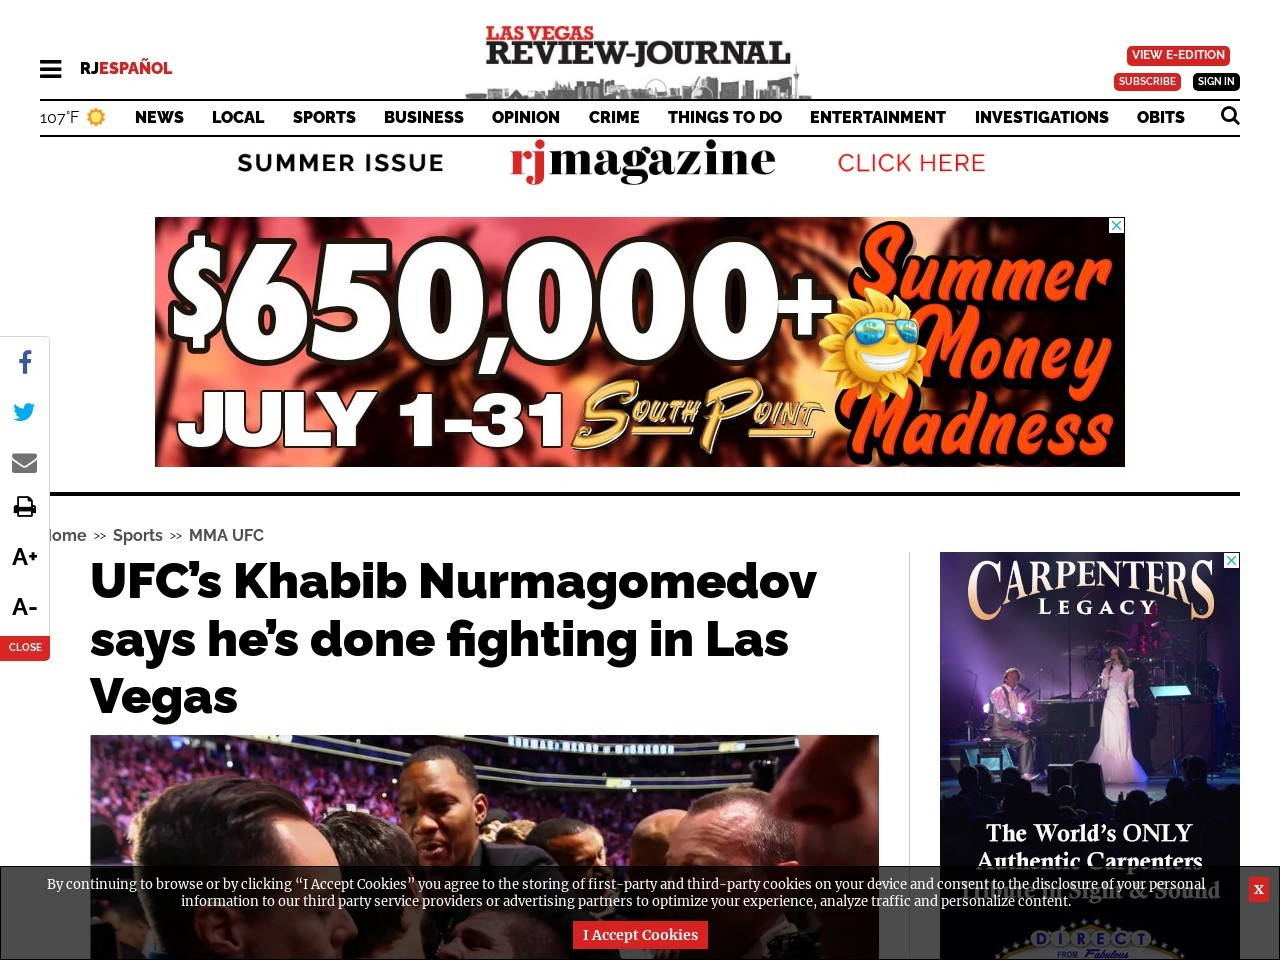 UFC's Khabib Nurmagomedov says he's done fighting in Las Vegas